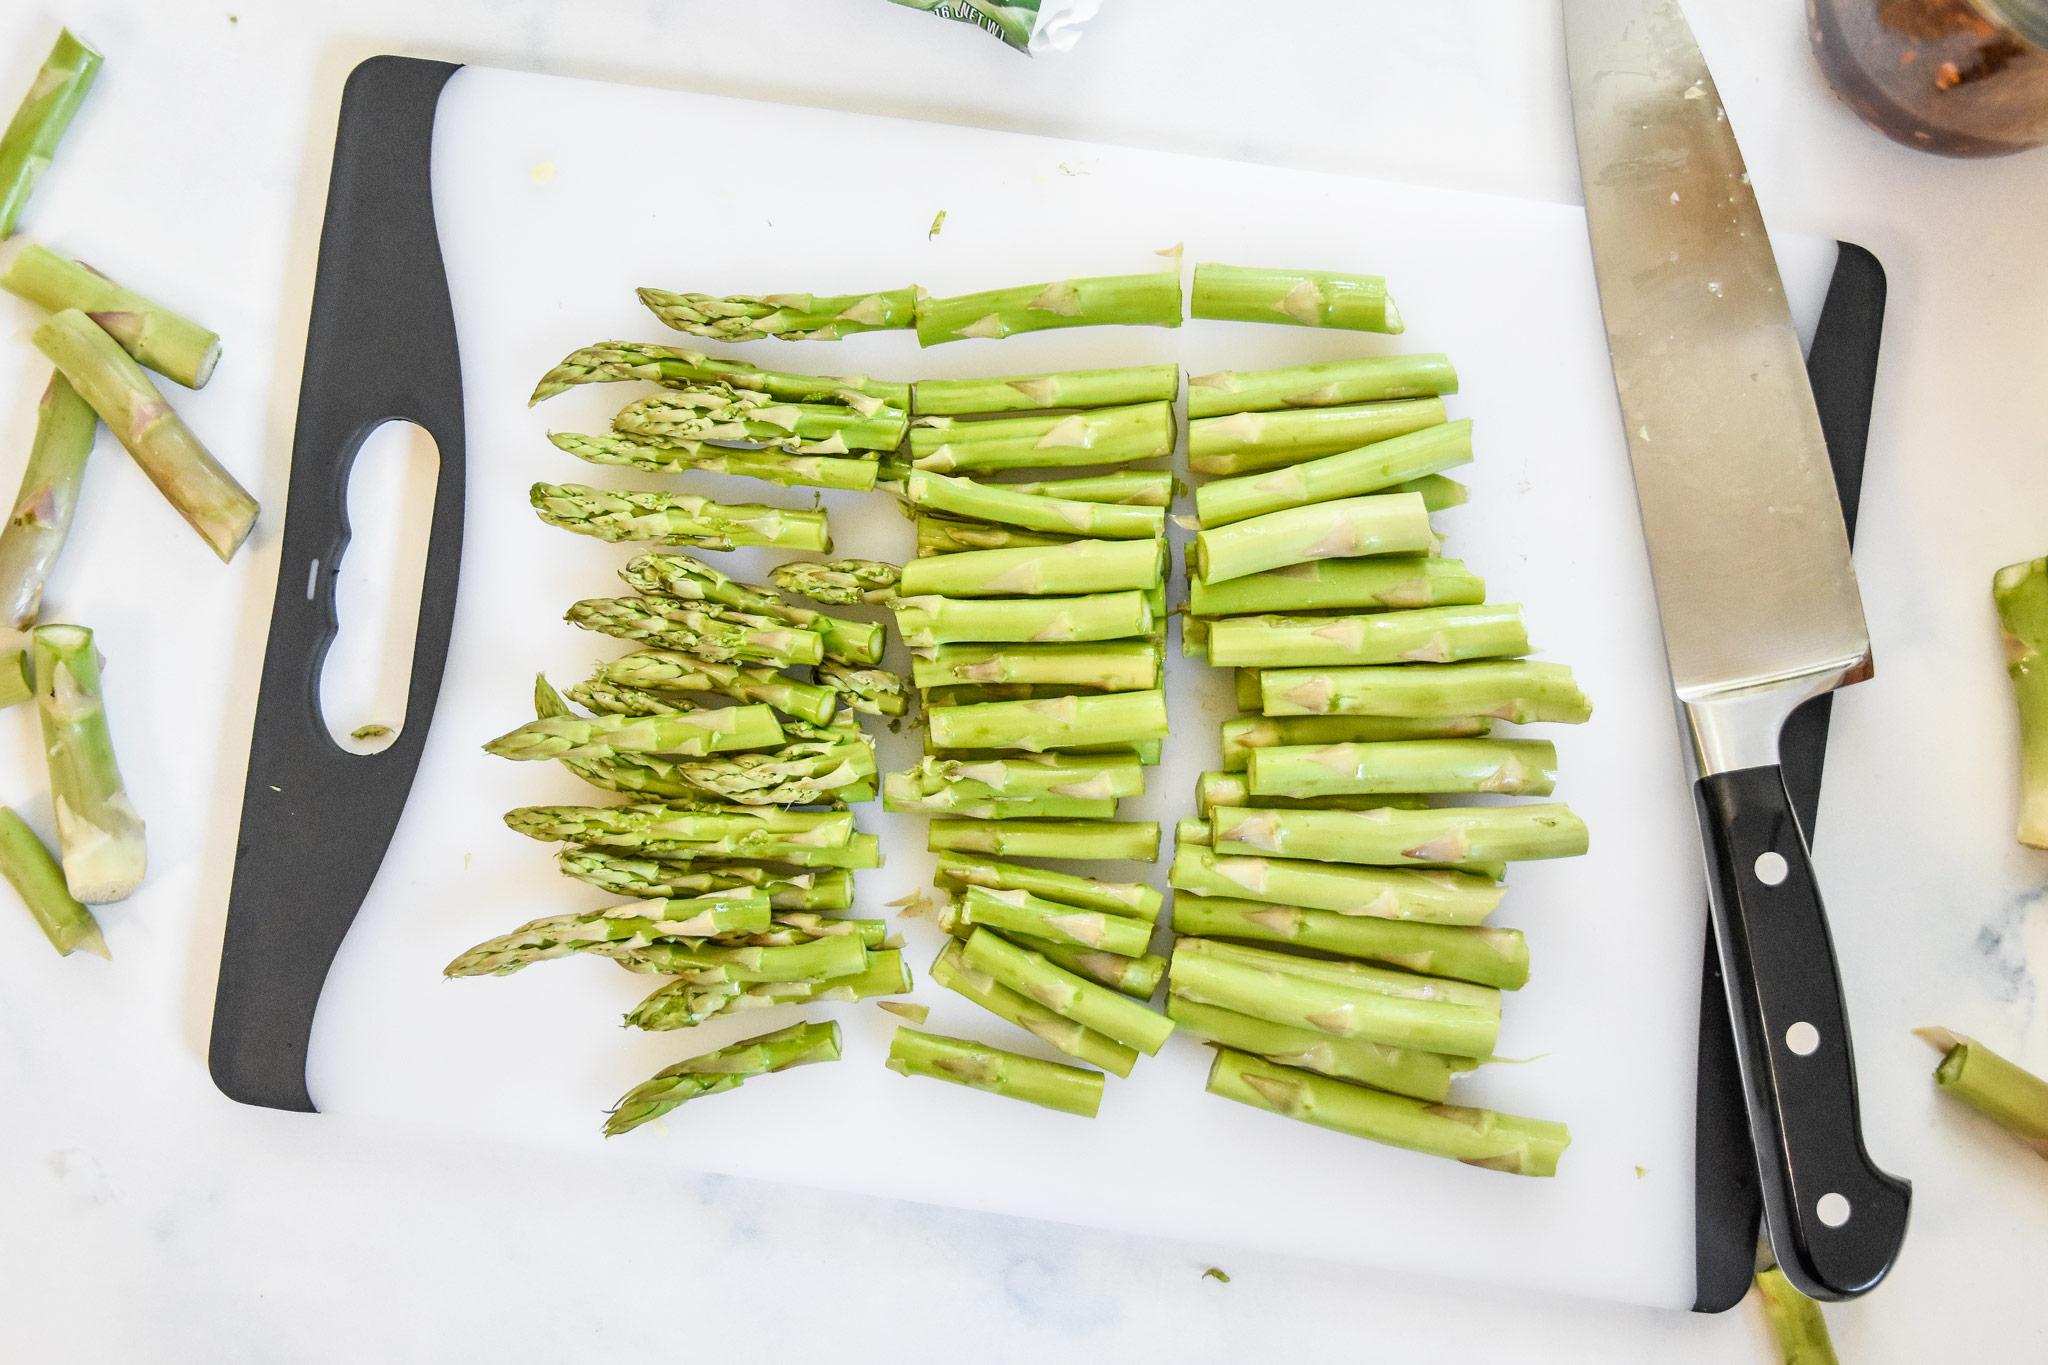 asparagus cut into thirds on a cutting board